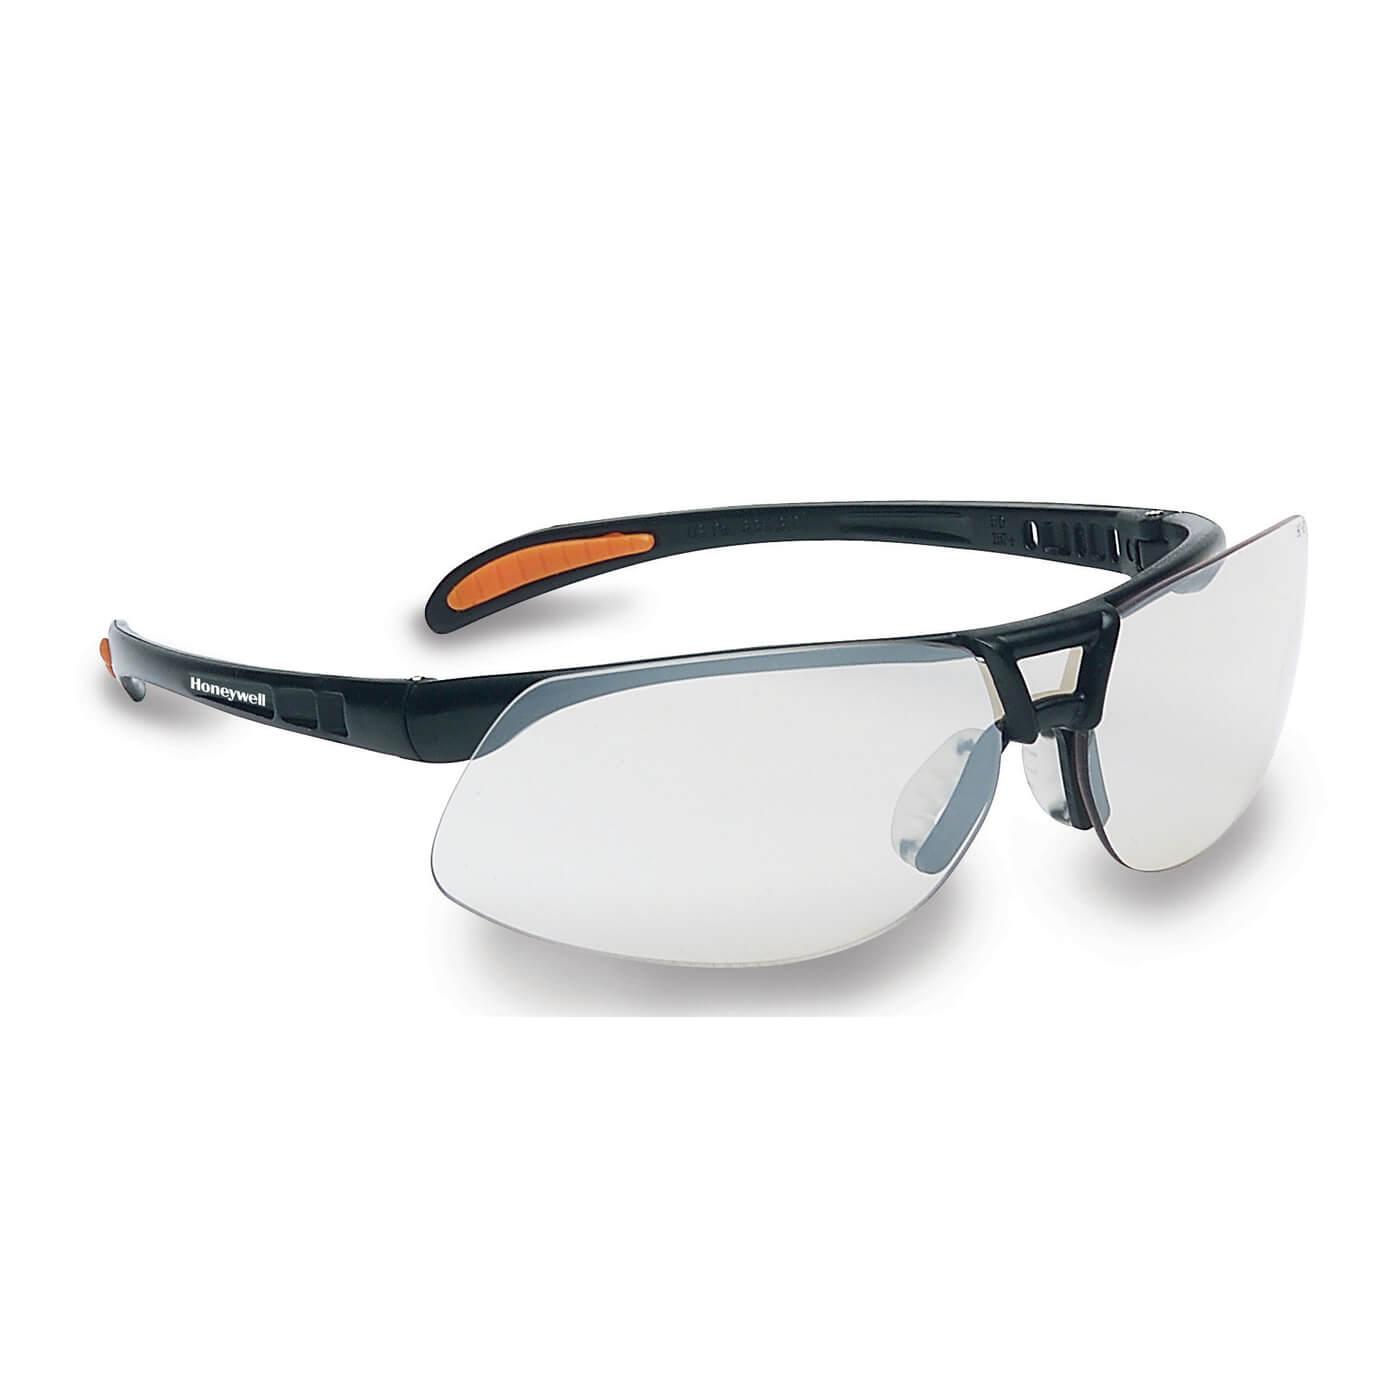 Okulary ochronne Protege 1015364 Honeywell